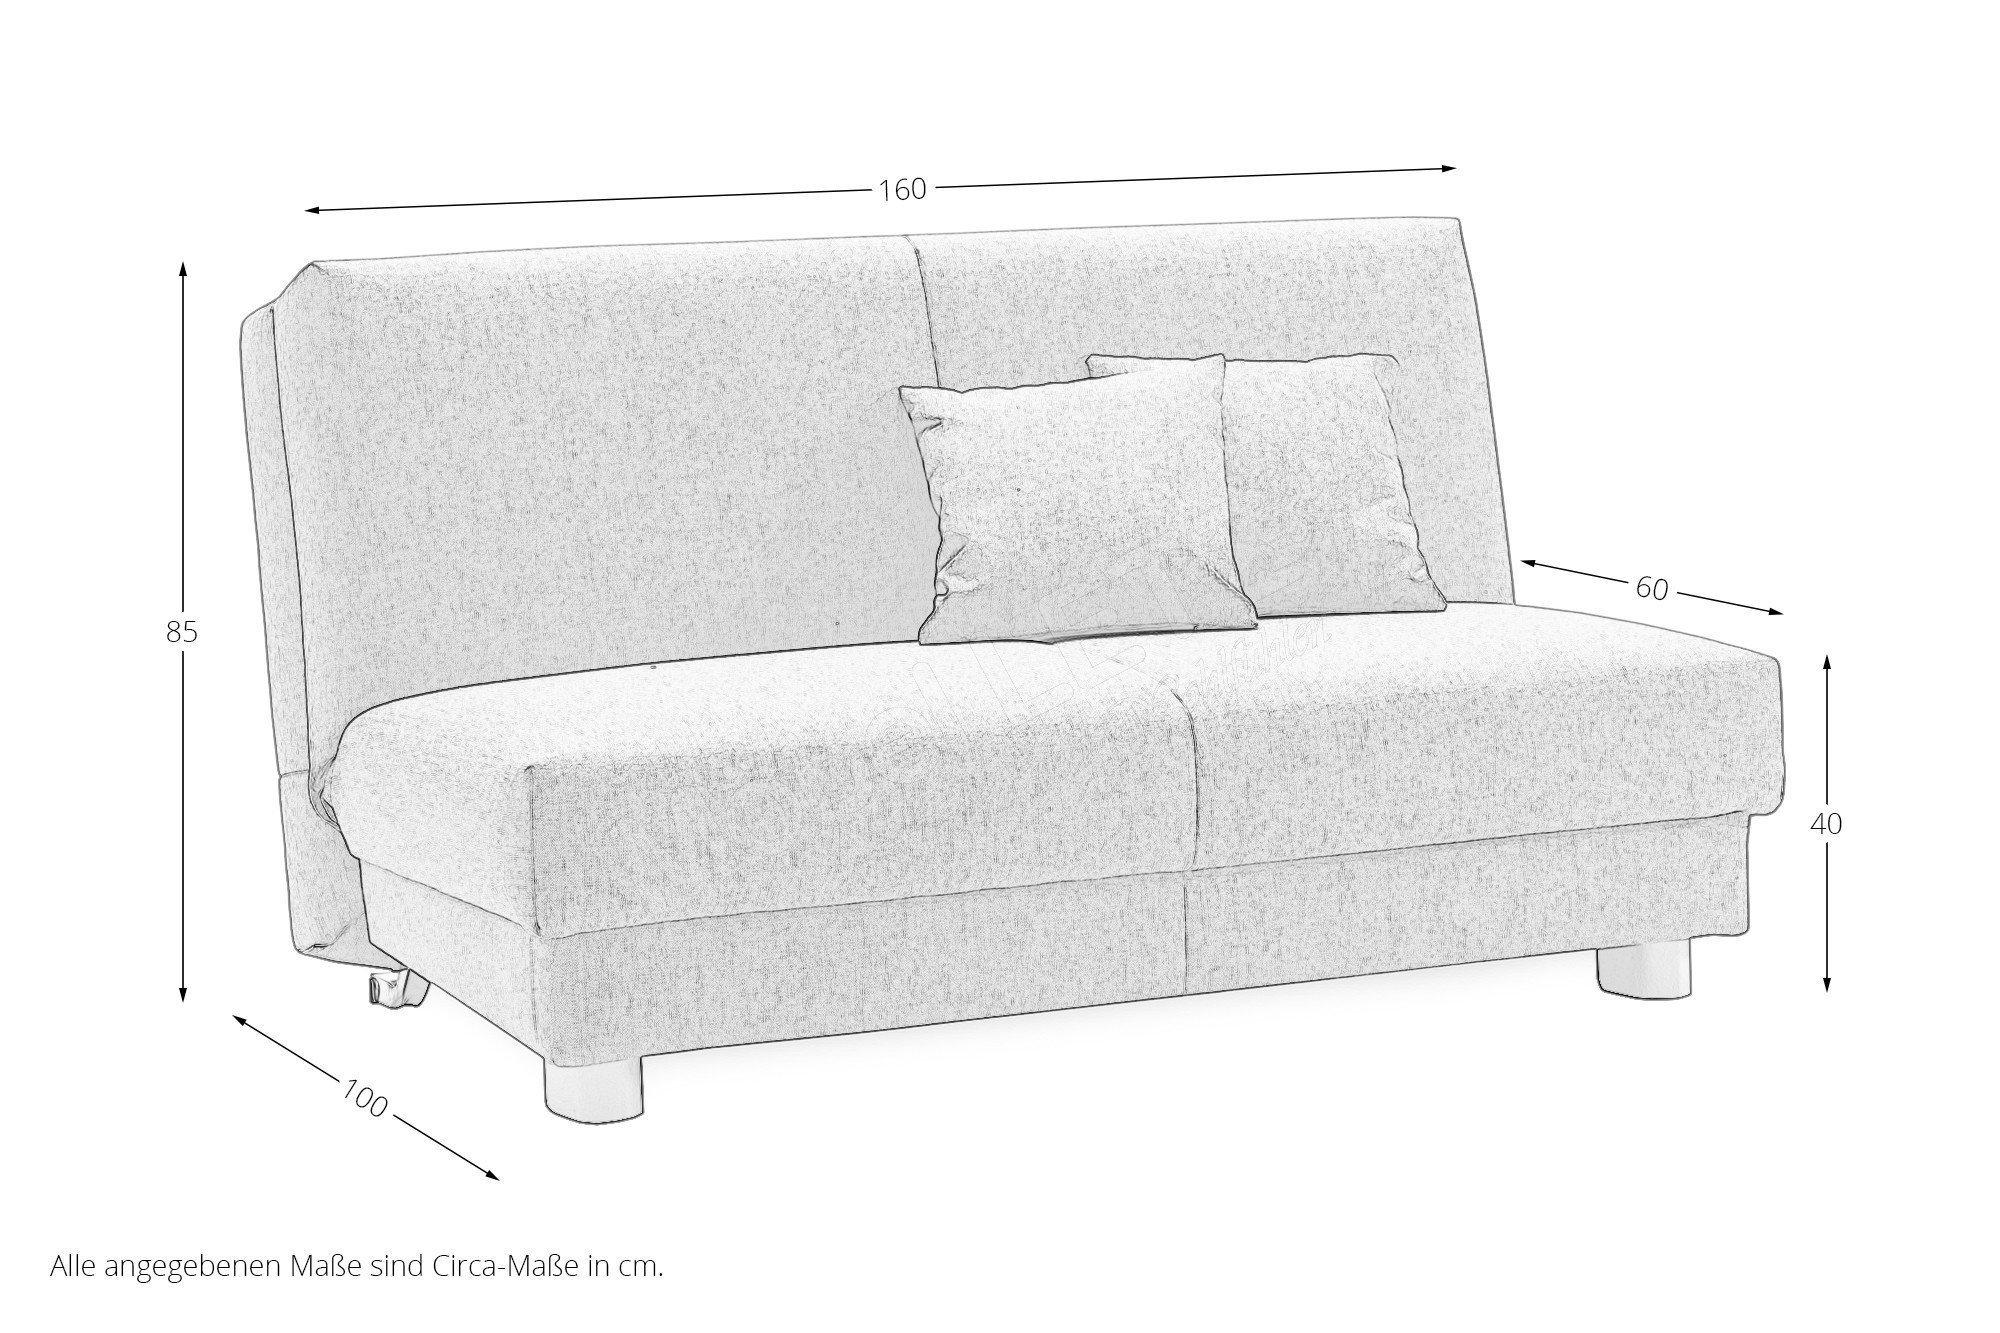 ell ell emma schlafsofa in hellgrau m bel letz ihr online shop. Black Bedroom Furniture Sets. Home Design Ideas